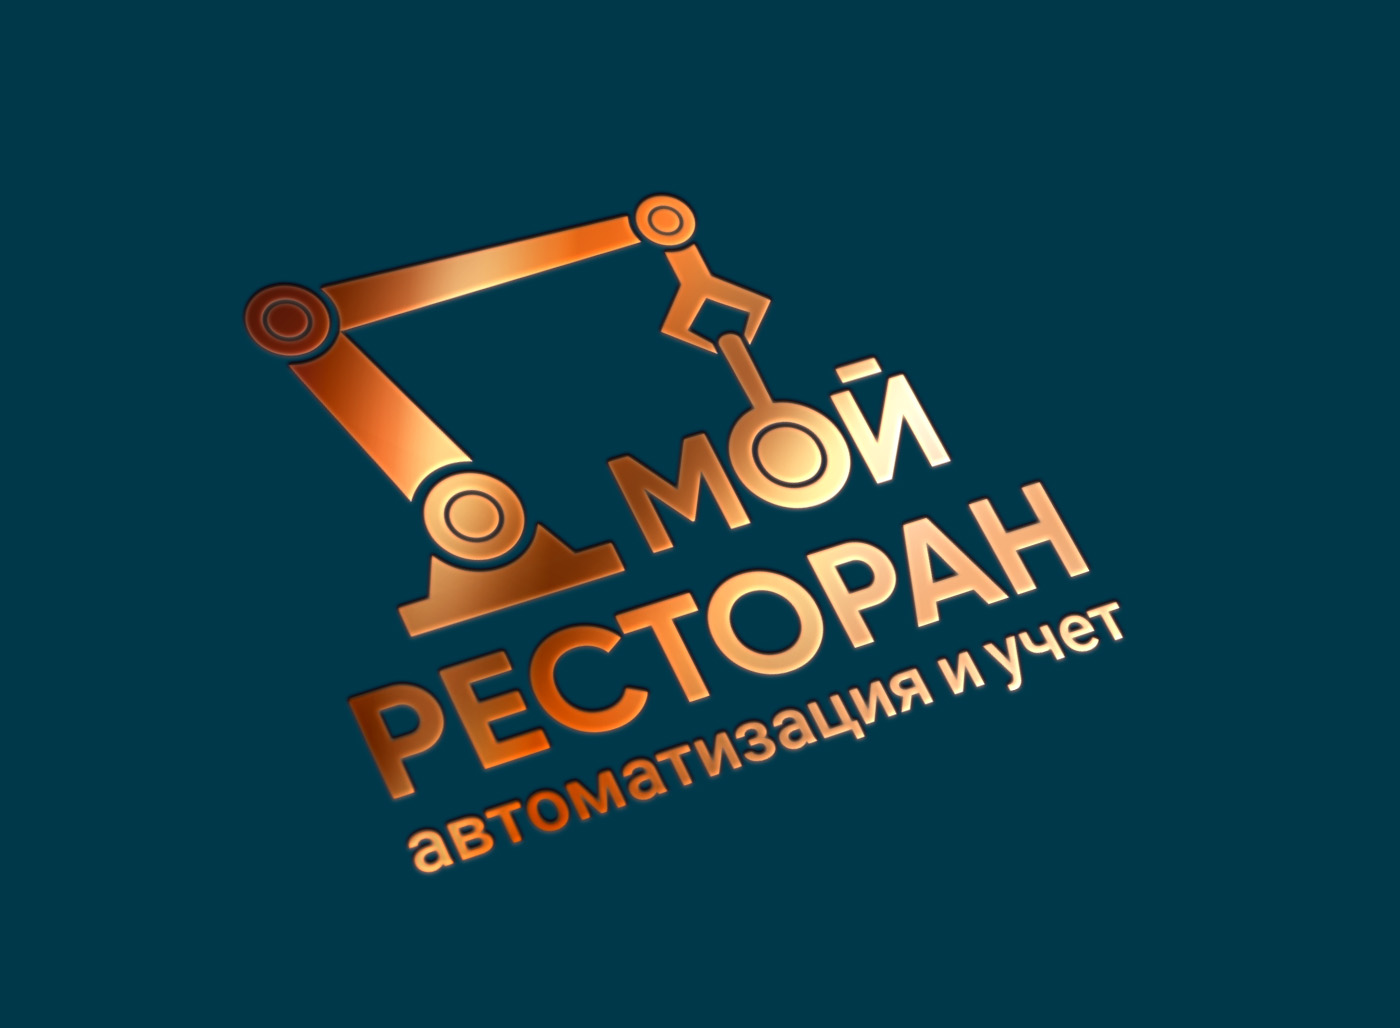 Разработать логотип и фавикон для IT- компании фото f_9635d552d7c99419.jpg